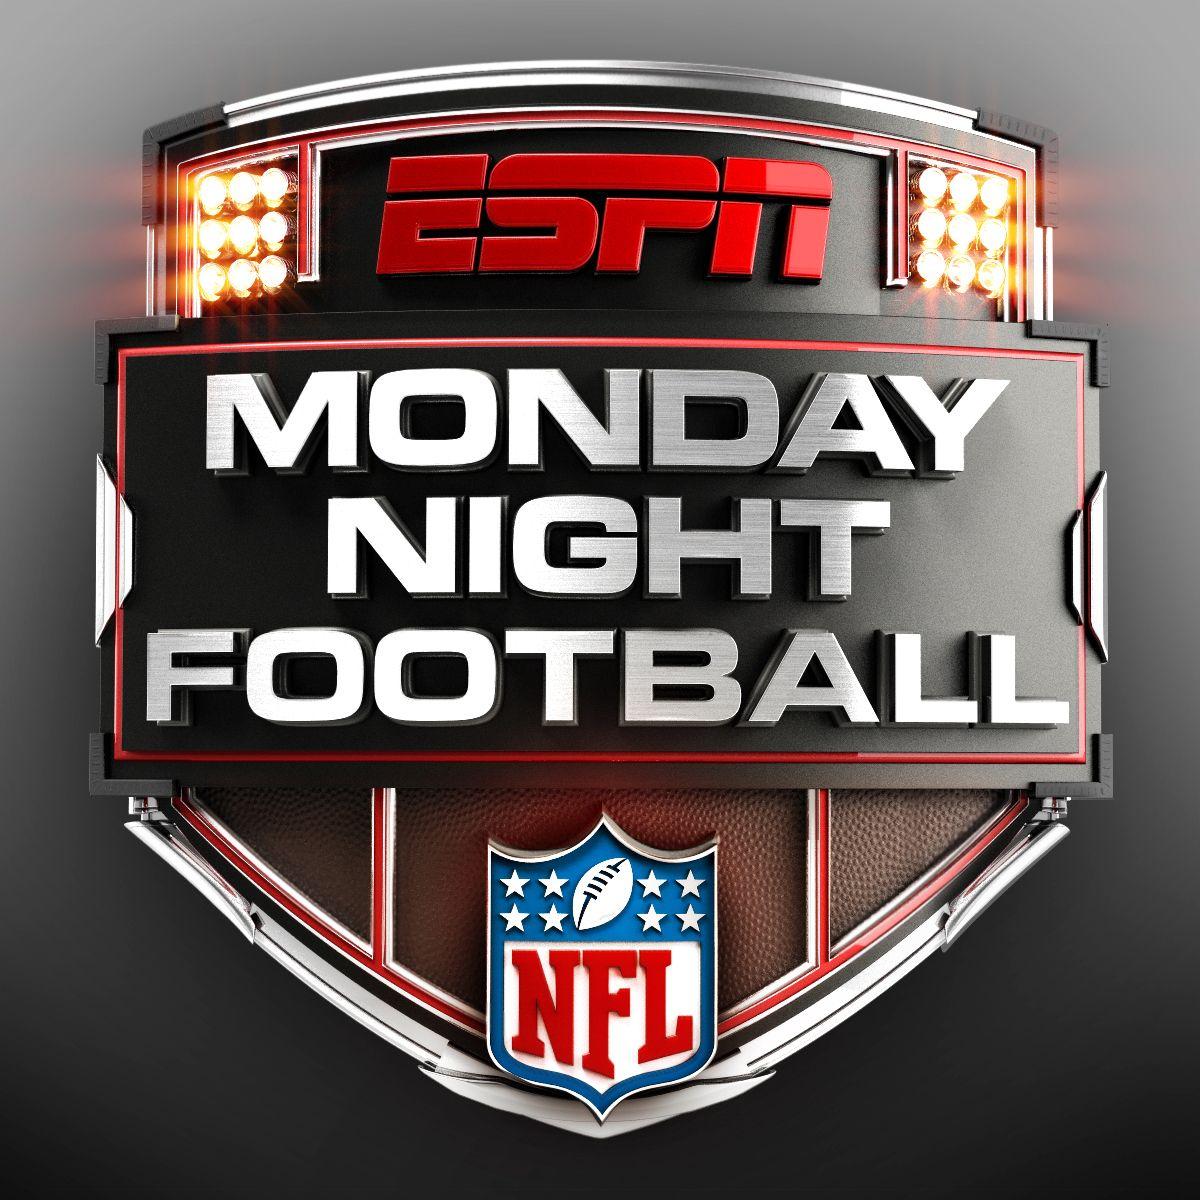 Football Team Monday Night Football Espn Monday Night Football Football Logo